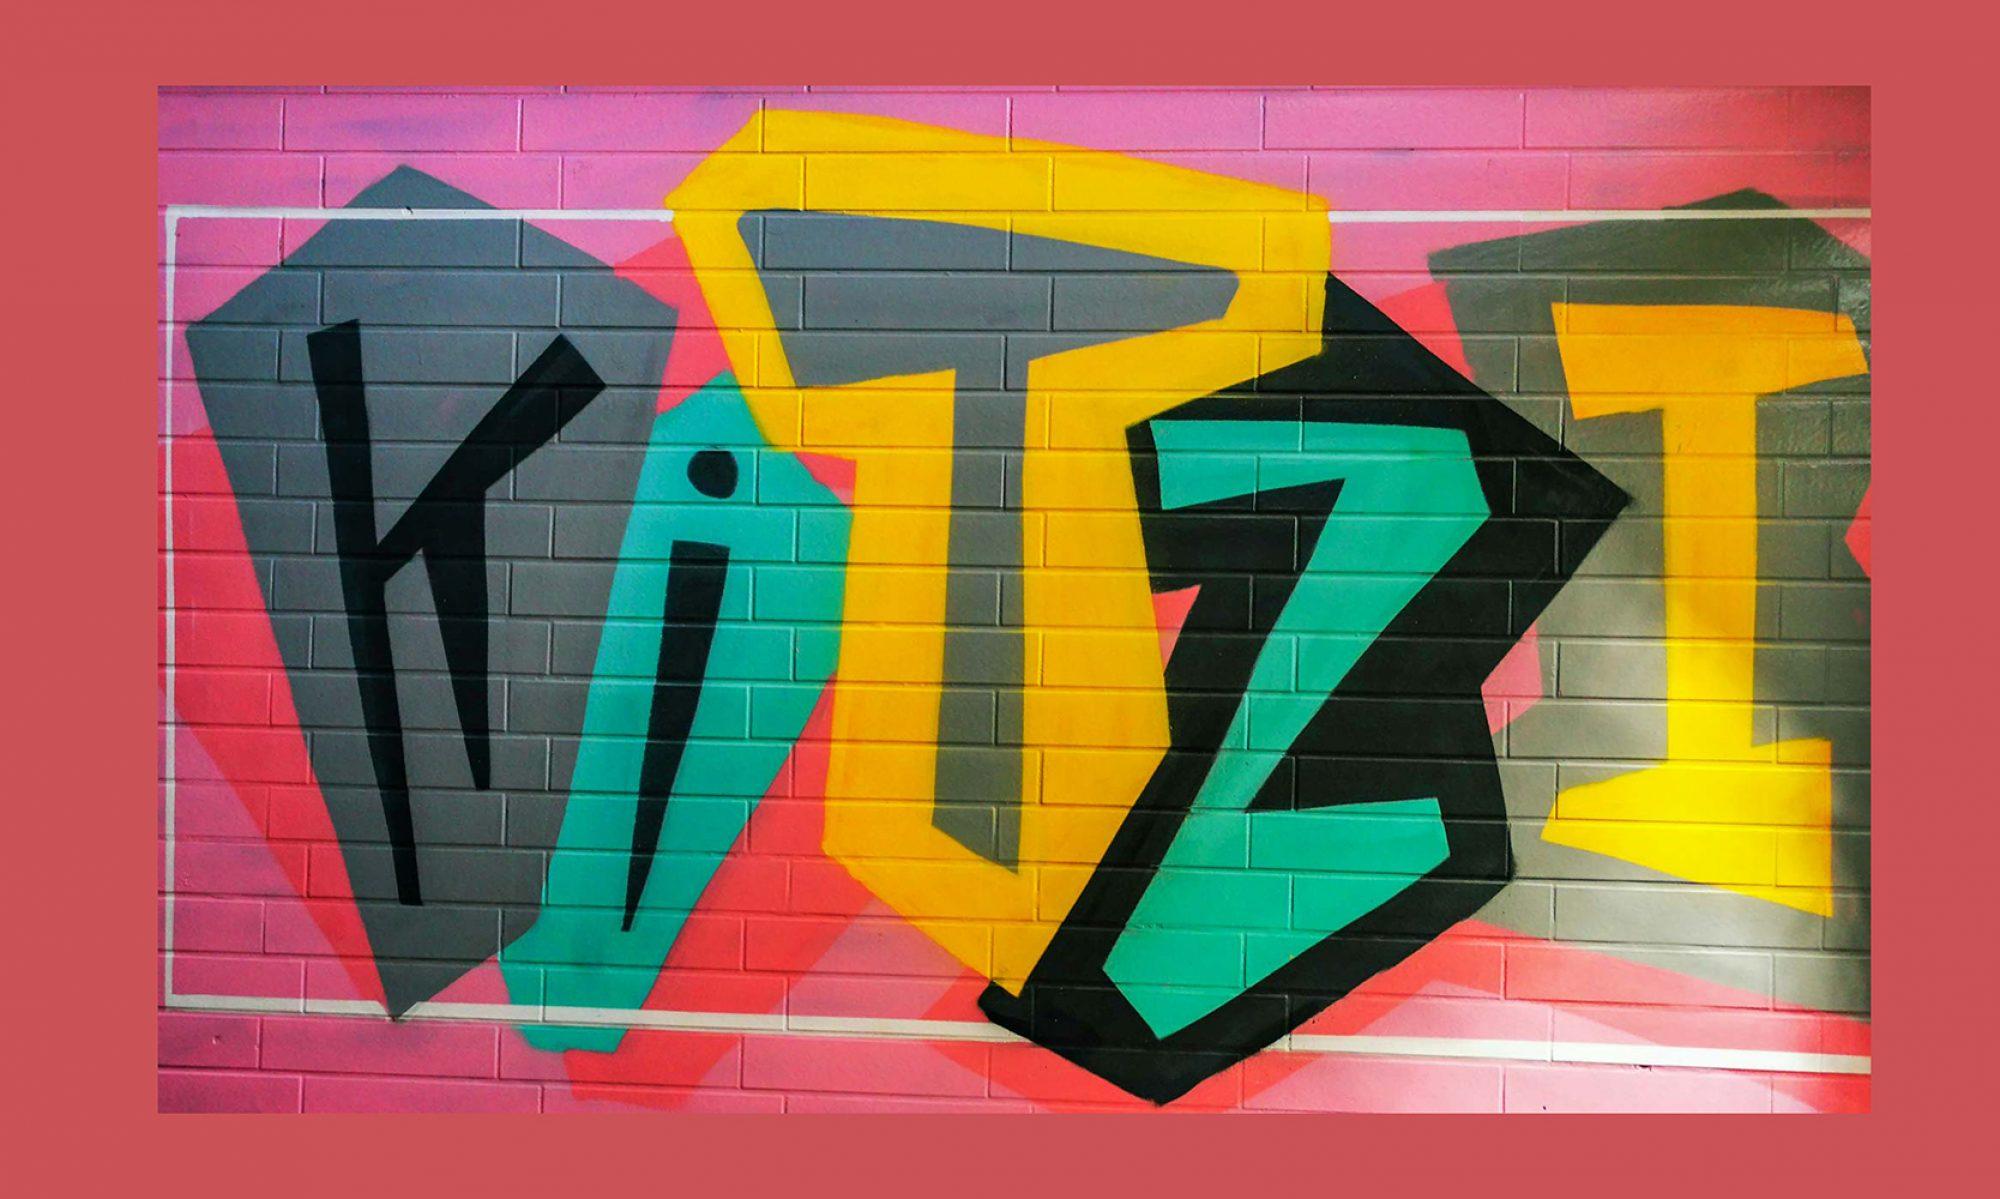 KitziBlog